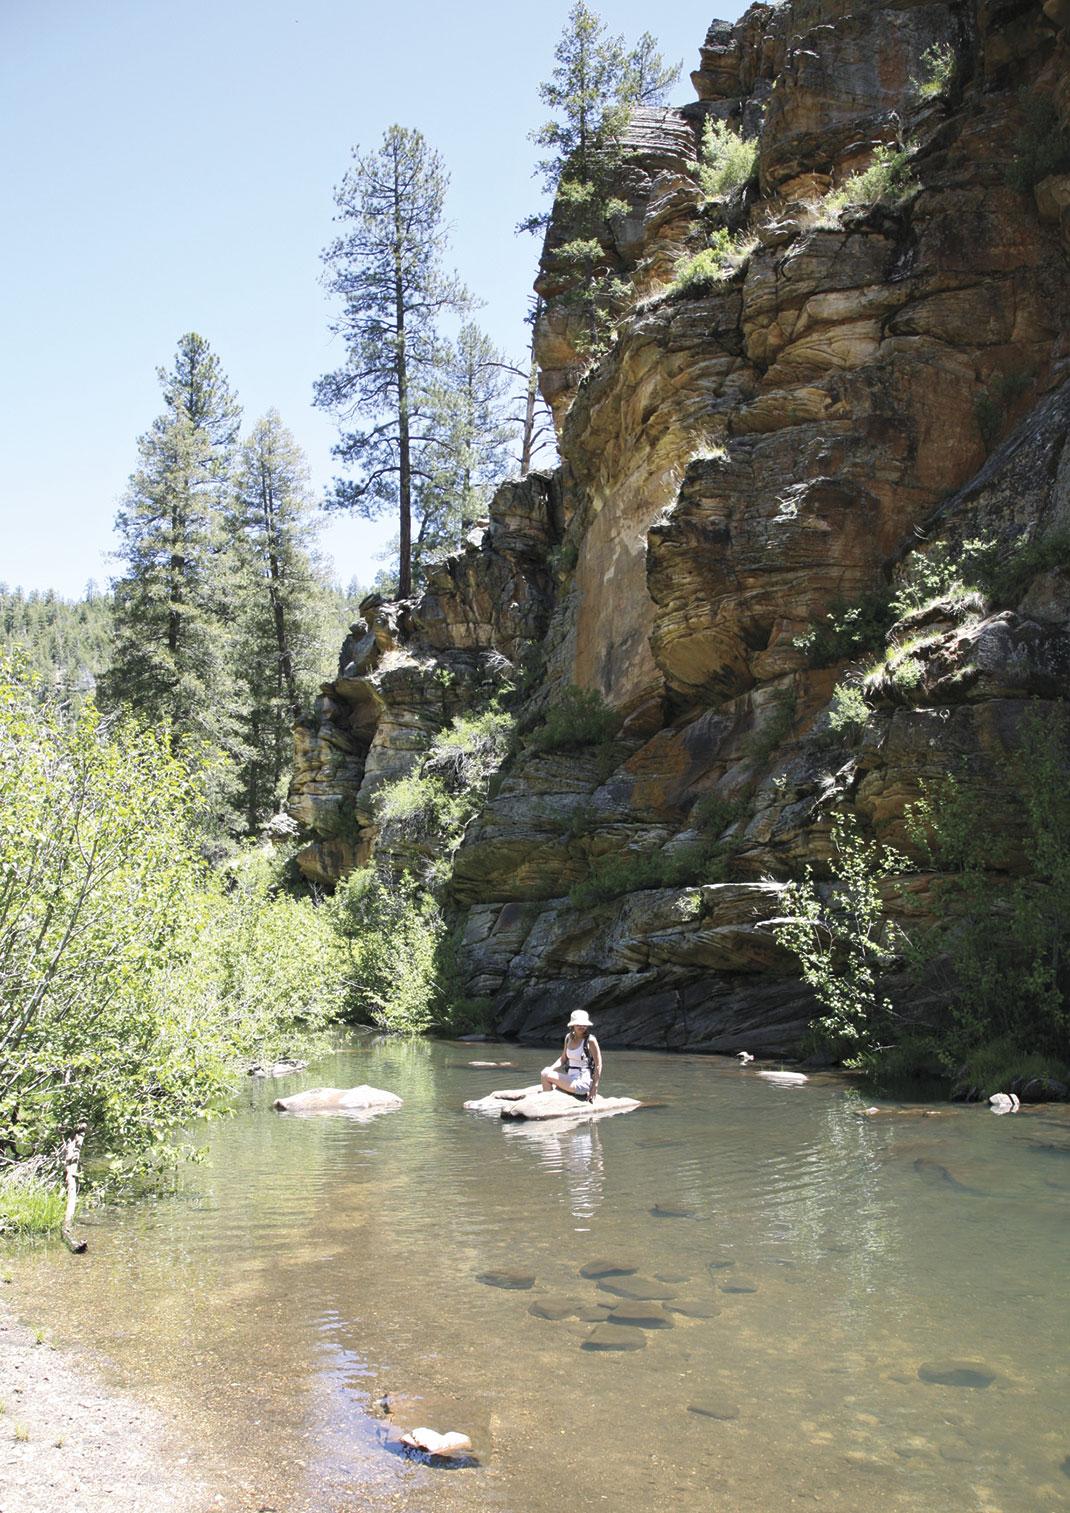 photo by Leah Lemoine; A canyon pool at Kinder Crossing.